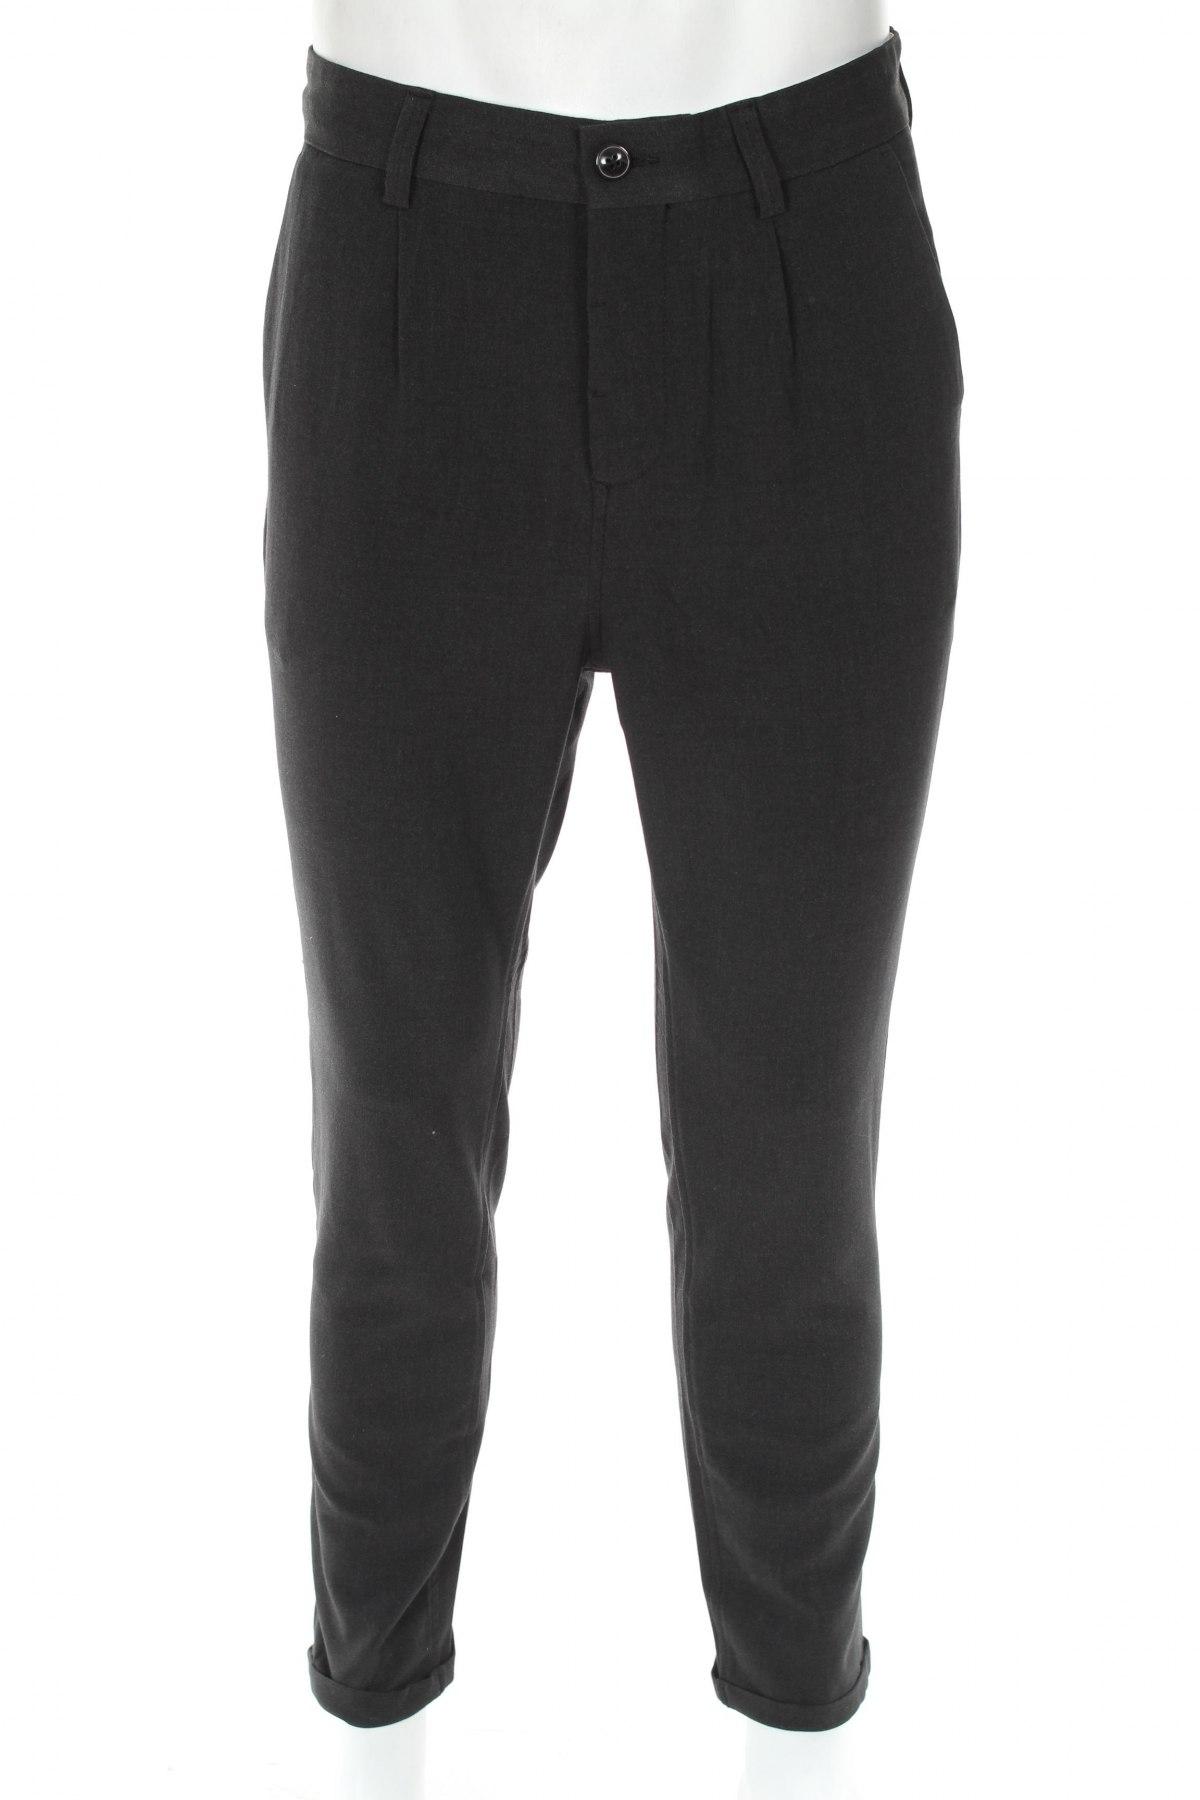 Мъжки панталон Jack & Jones, Размер M, Цвят Сив, 66% полиестер, 32% вискоза, 2% еластан, Цена 49,40лв.